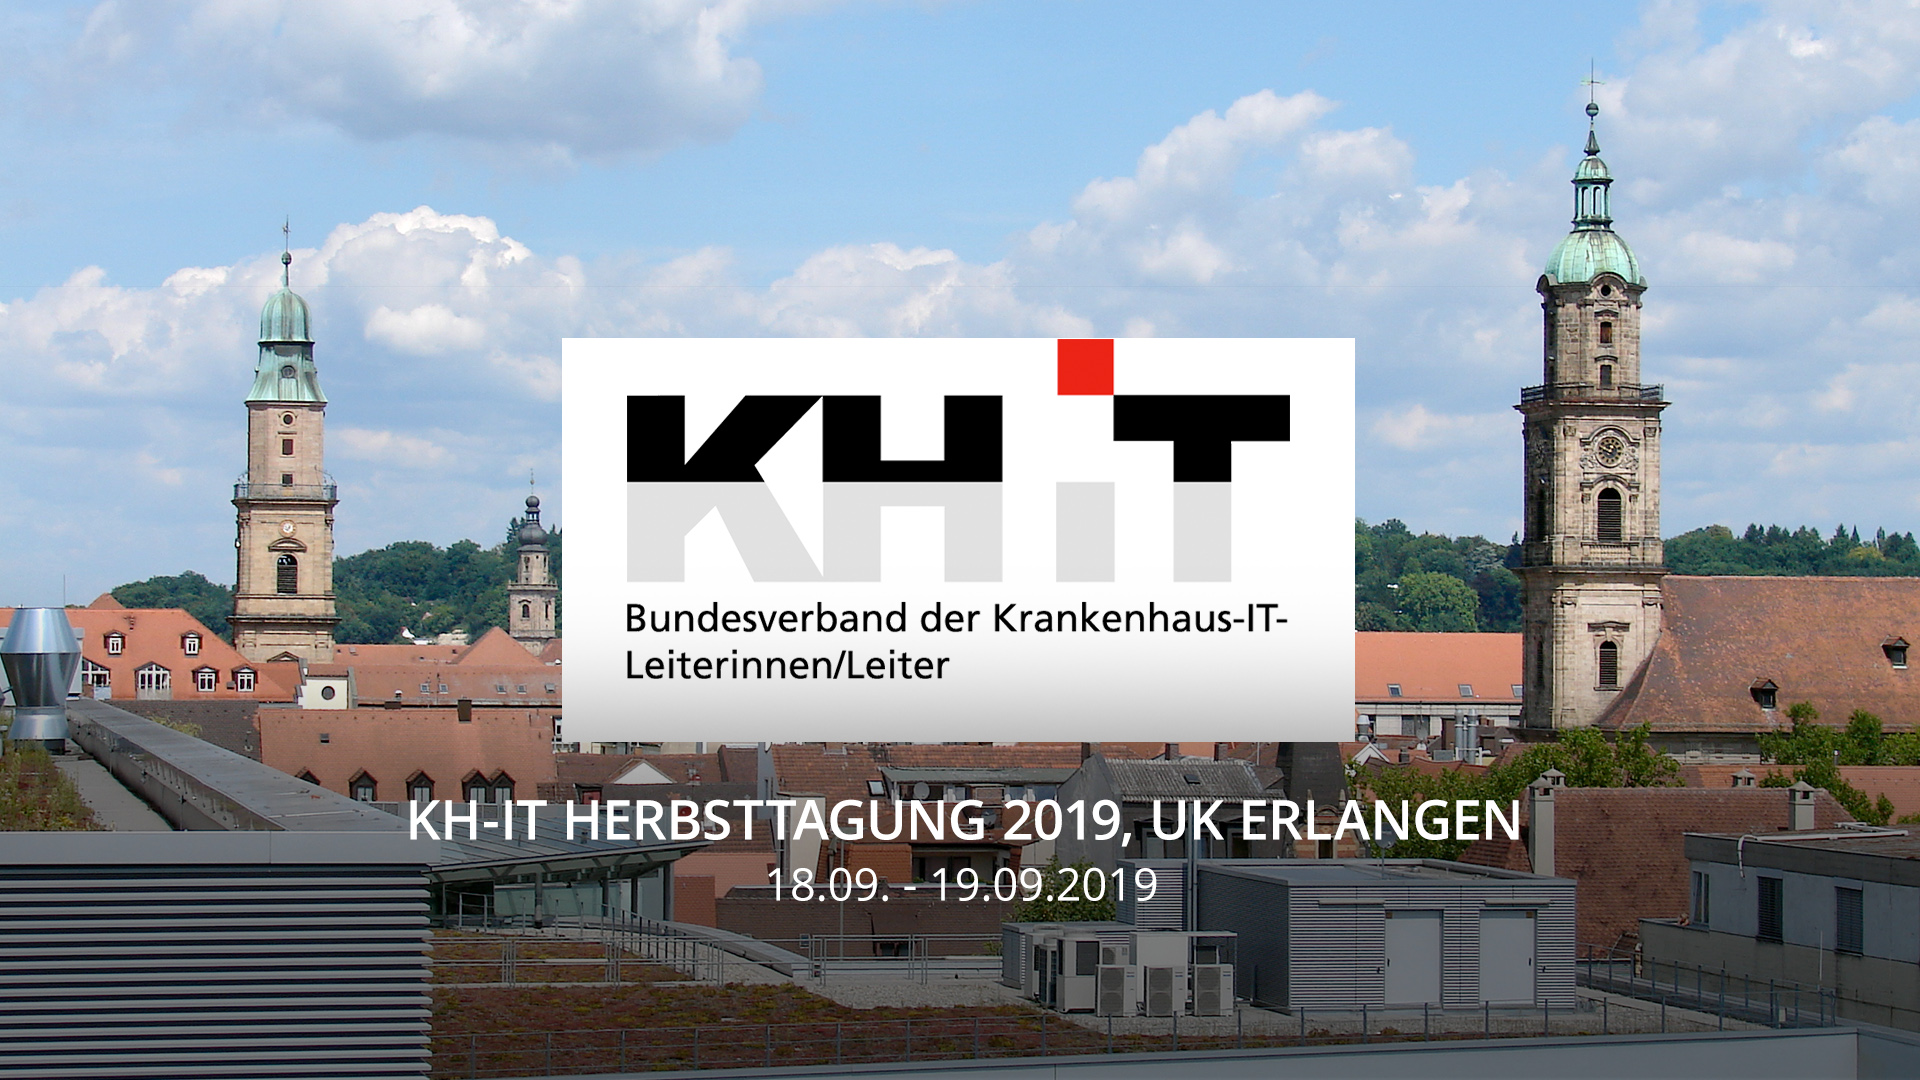 September19 - KH-IT Herbsttagung, UK Erlangen